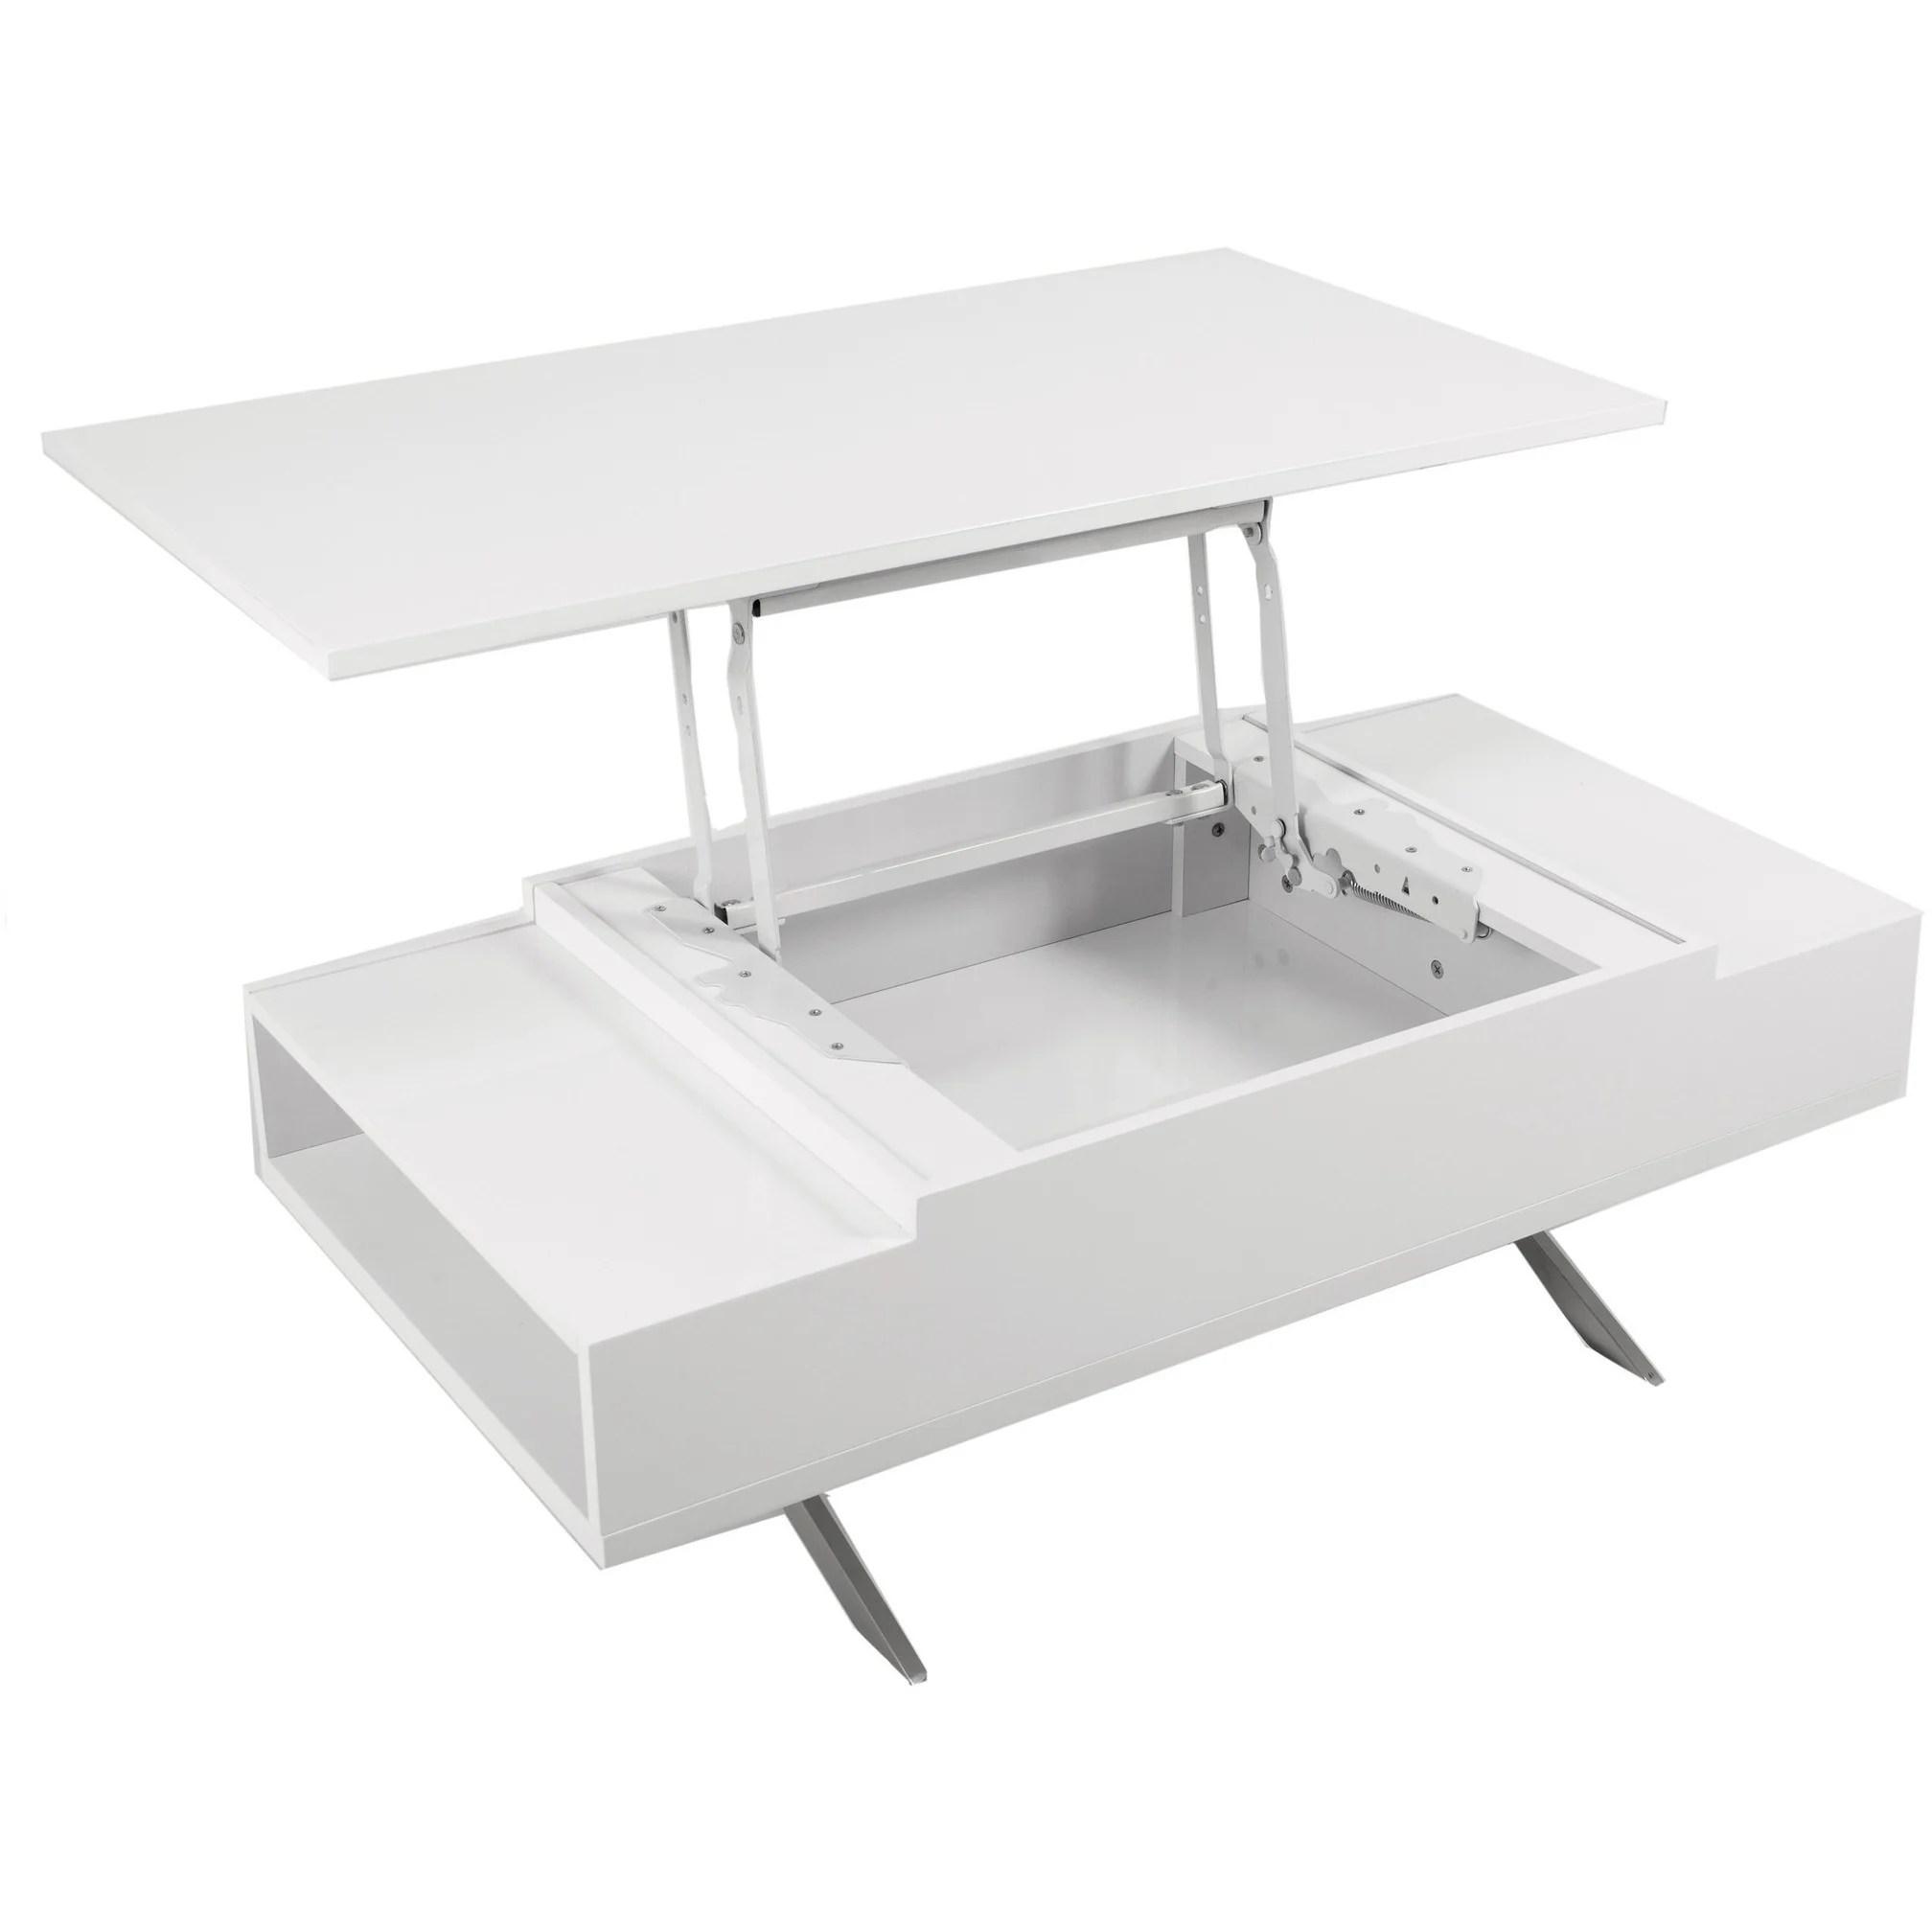 stelar white lift top rectangular coffee table by matrix